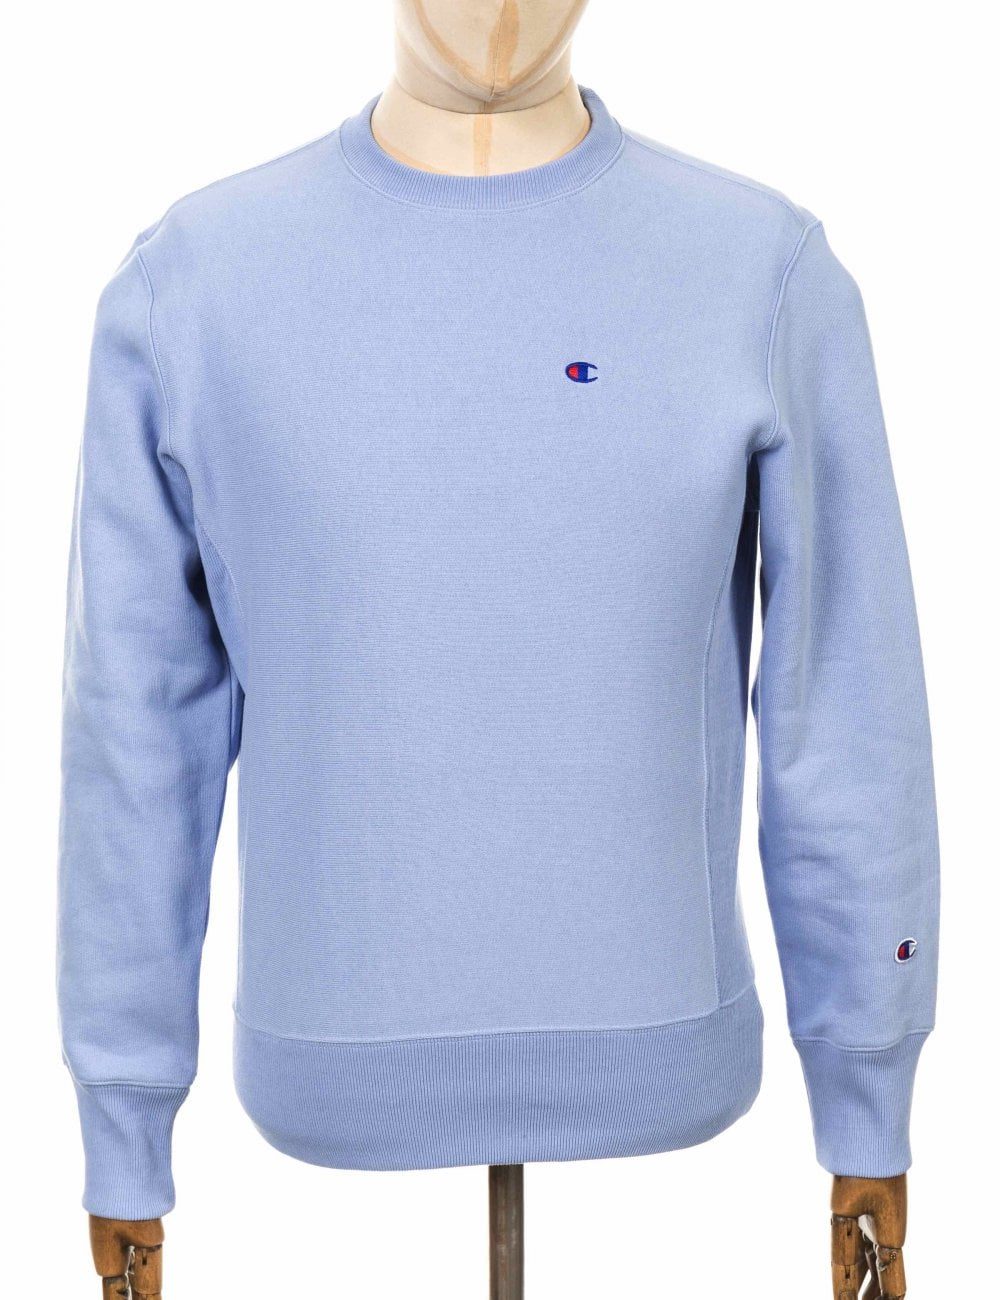 eb68cfbde5f5 Champion Reverse Weave Crewneck Sweatshirt - LLU Light Blue - Clothing from  Fat Buddha Store UK